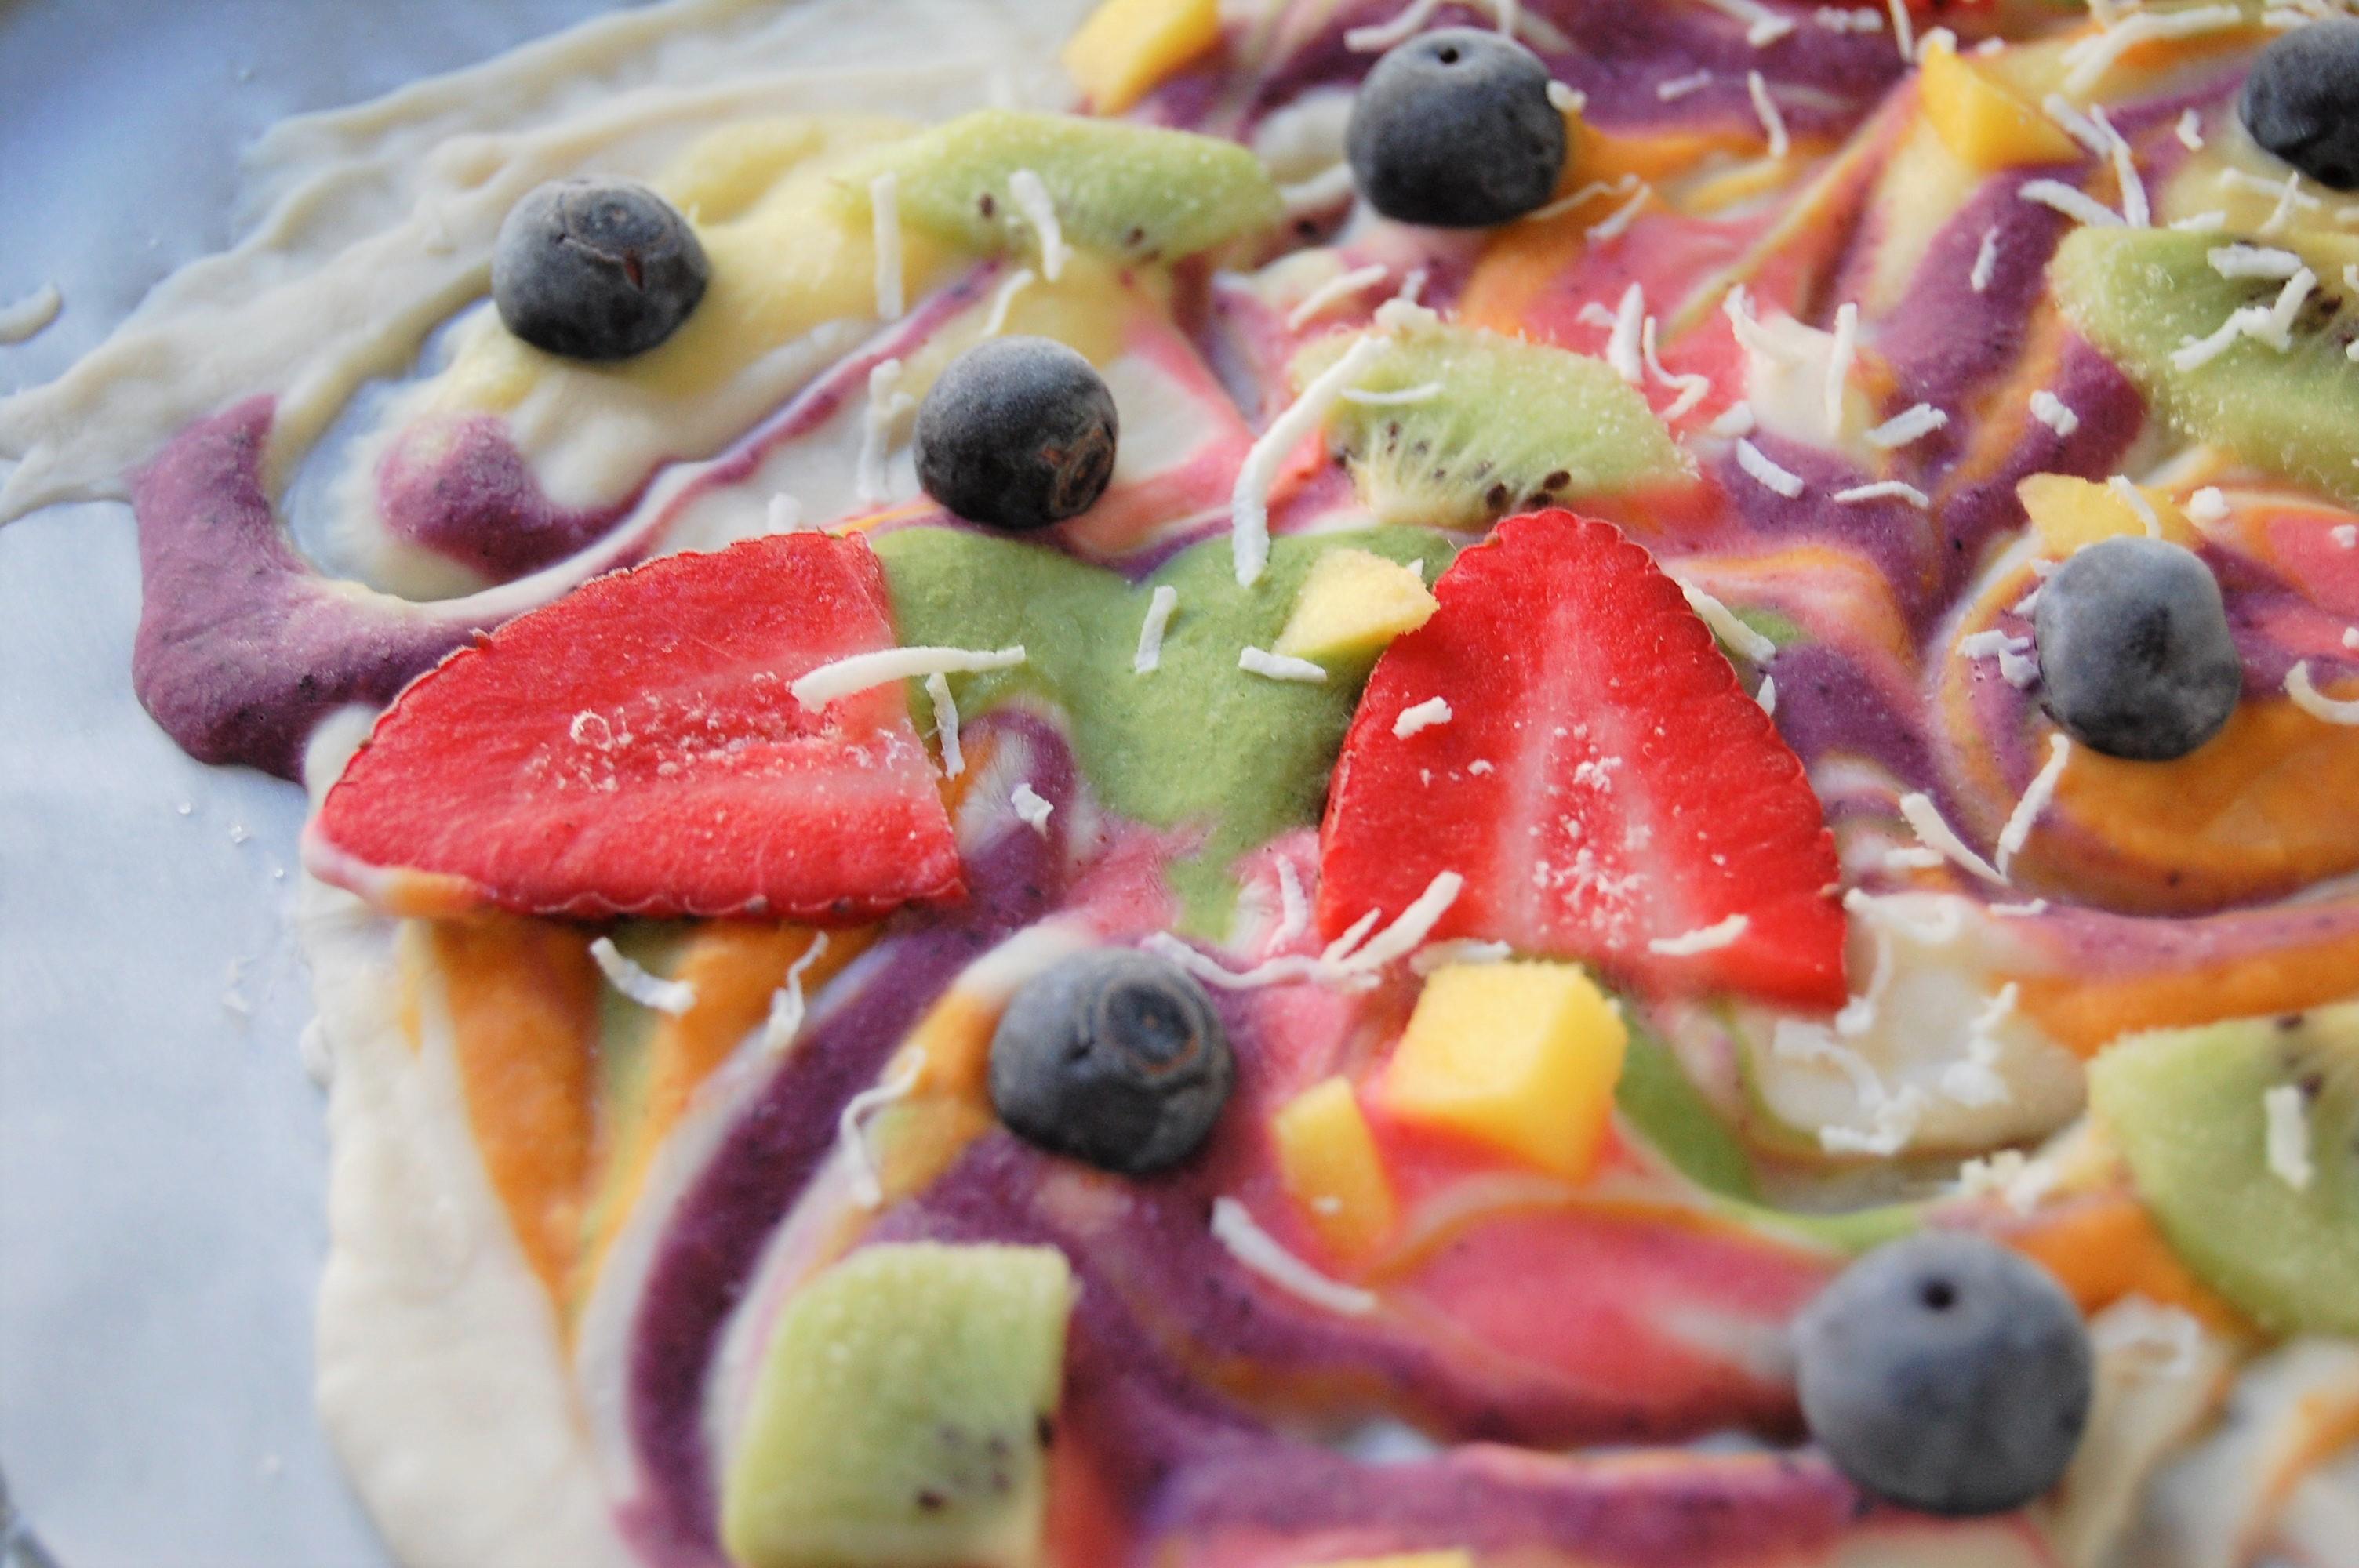 Rainbow Frozen Yogurt Bark   Healthy Recipe   Recipes   Rainbow Food   Frozen Yogurt Bark   Nutrition   Dietitian   Fruits   Vegetables   Fun Food   Cooking with Kids   Healthy Snack   Healthy Treat